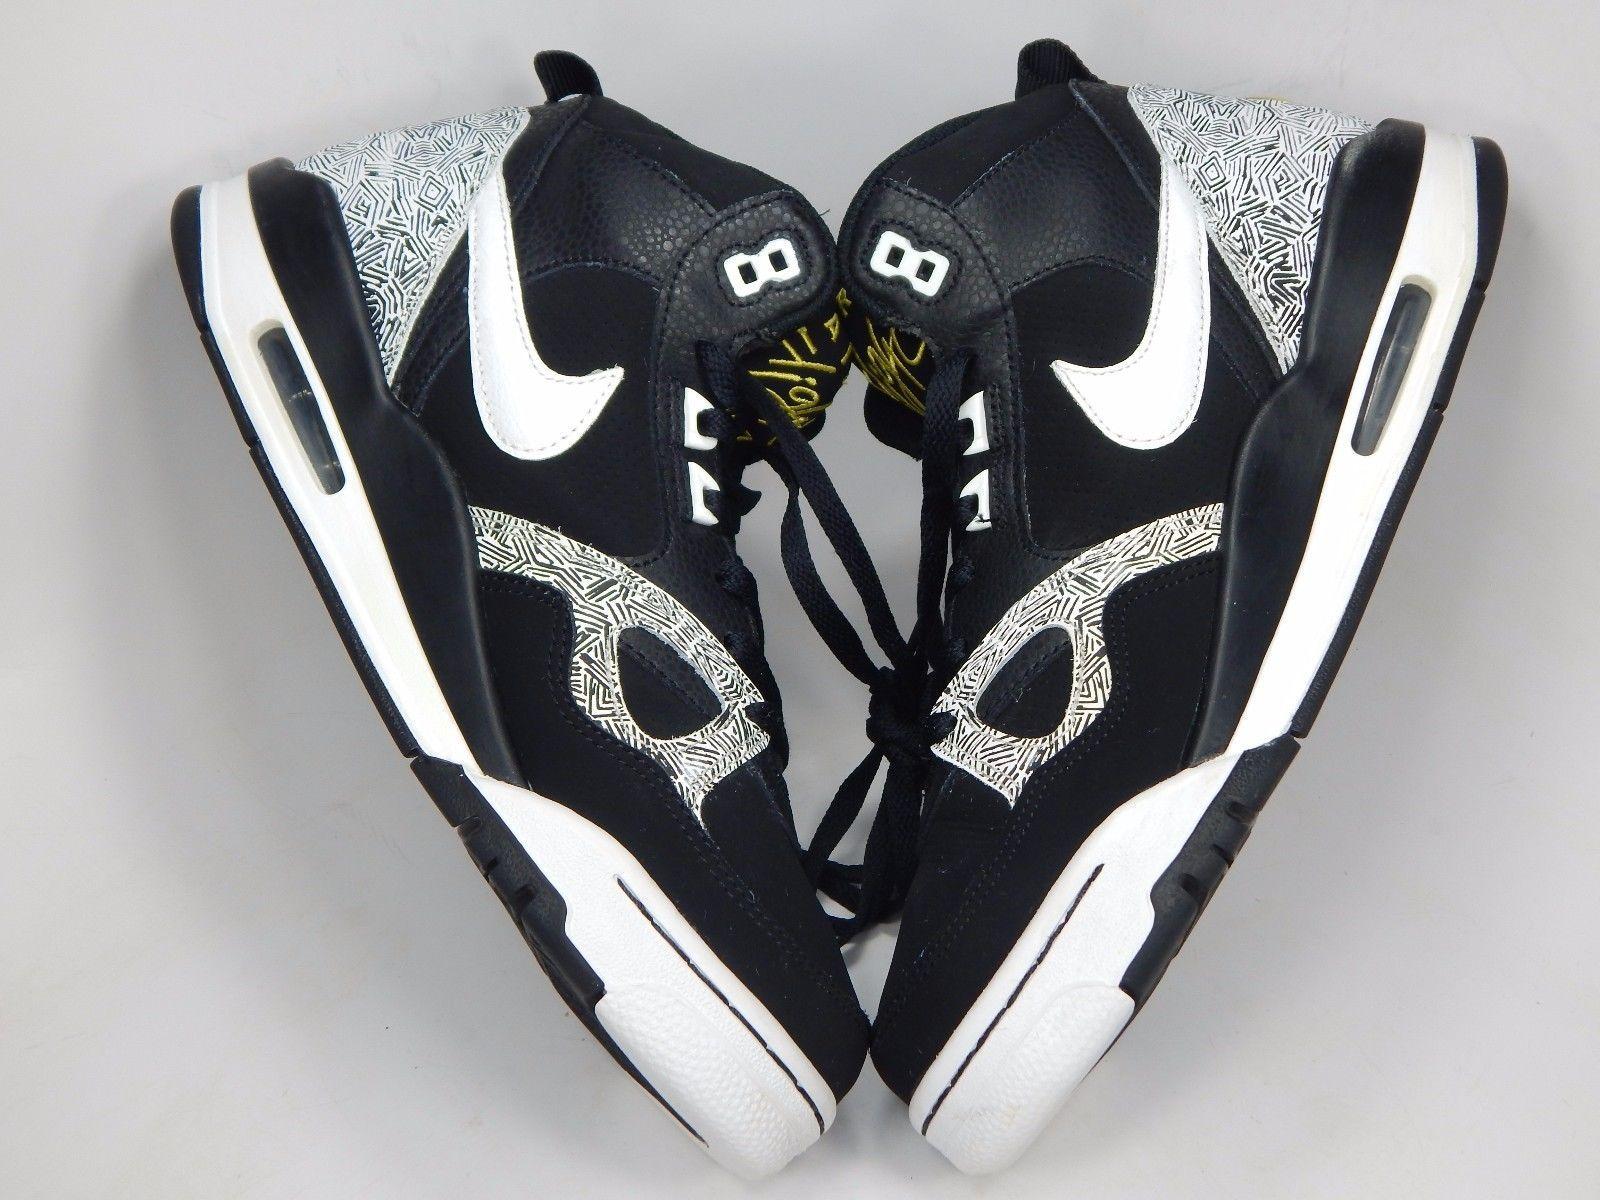 Nike Flight 13 Mid Top Men's Basketball Shoes Size US 9 M (D) EU 42.5 579961-008